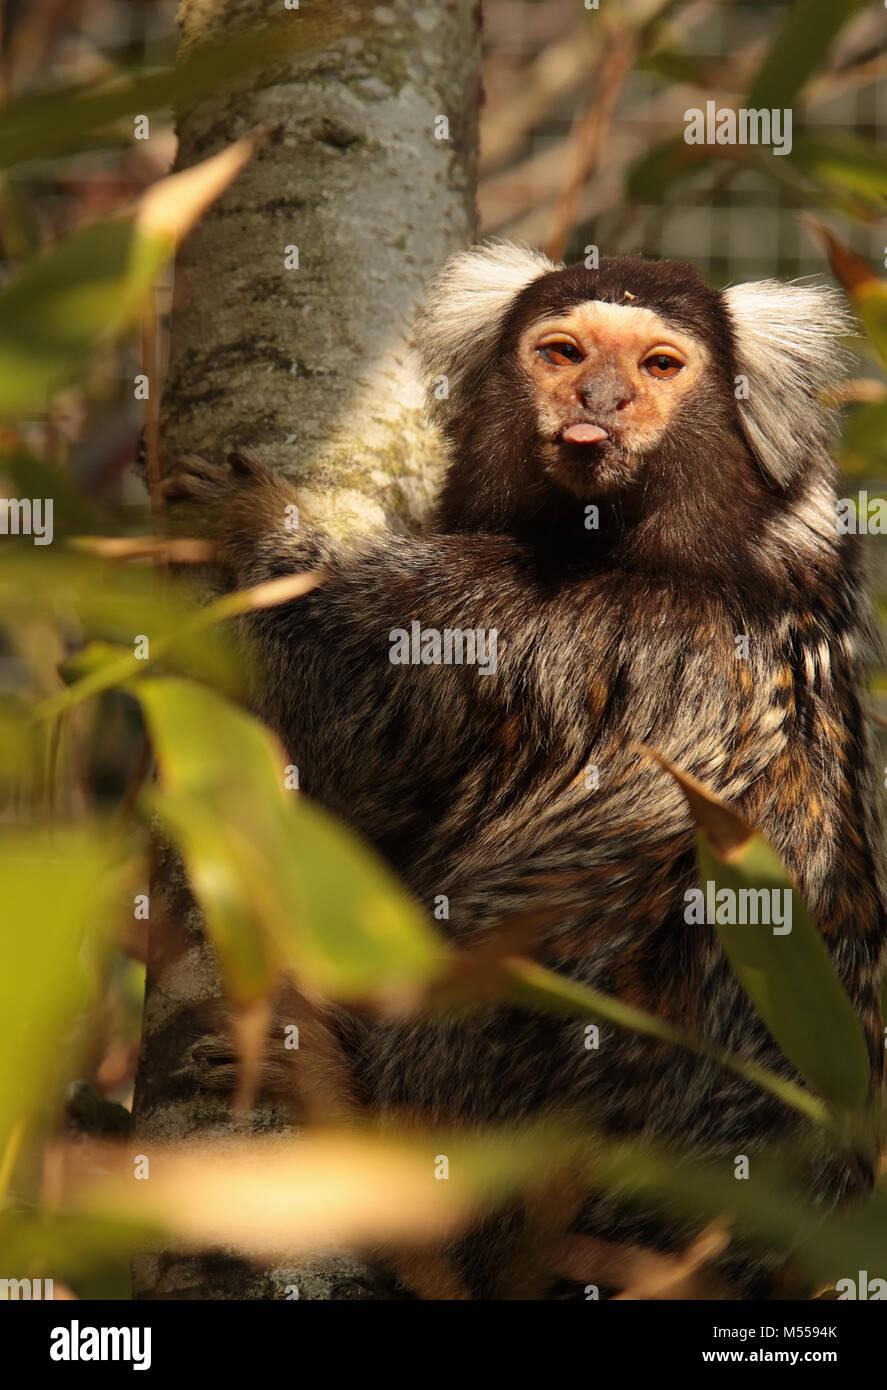 Monkey business Immagini Stock